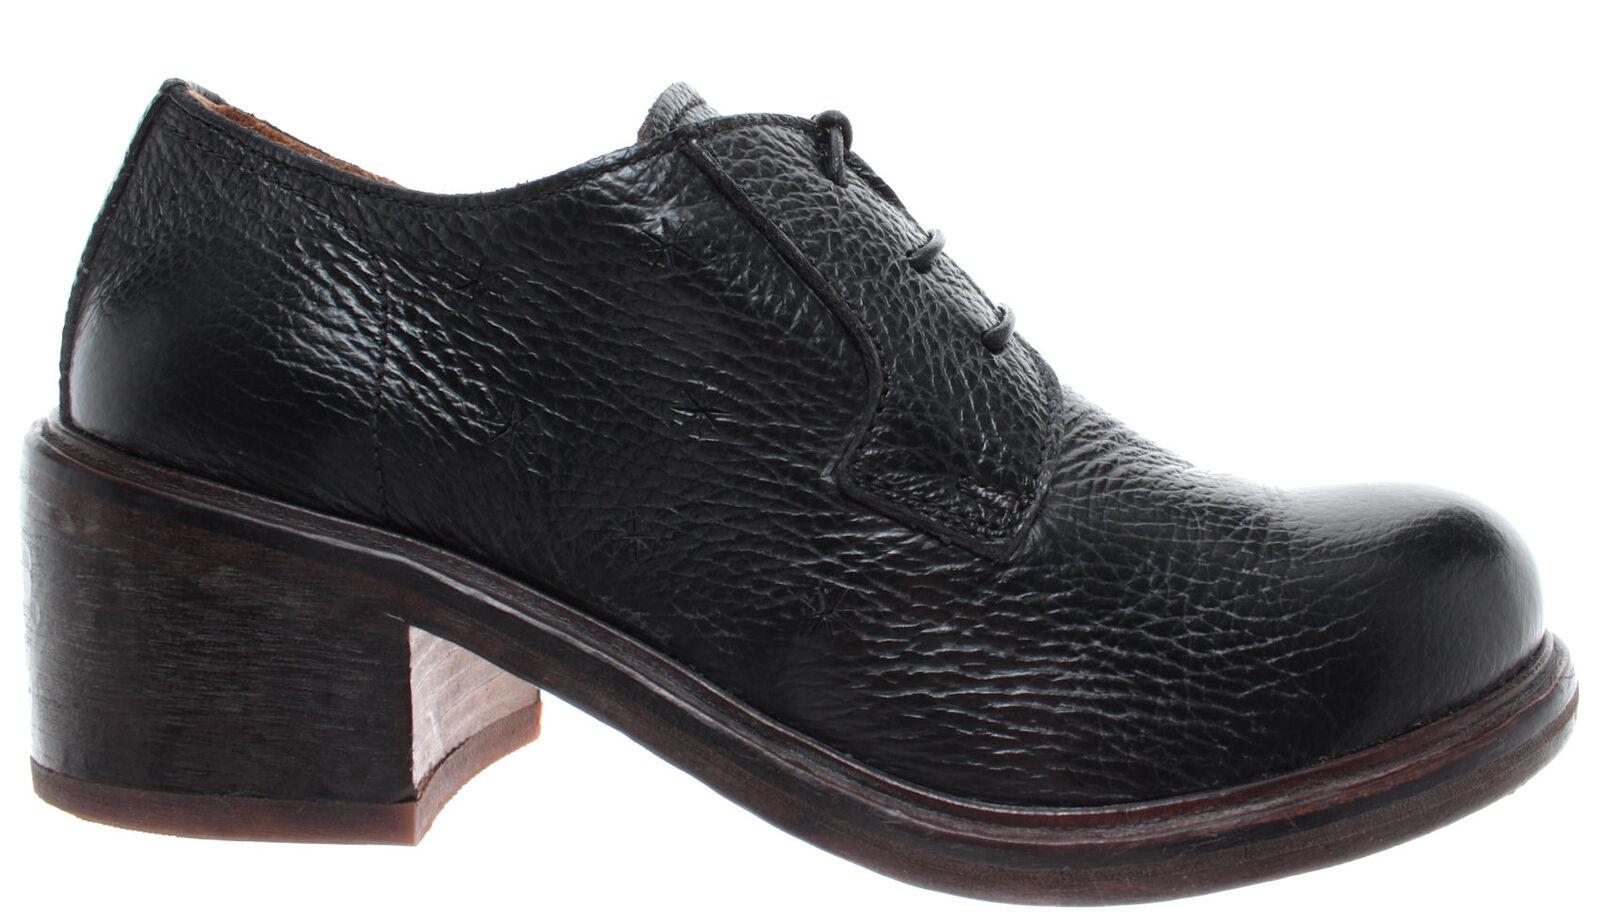 MOMA 40801-Y1 Vitello negro negro negro Zapatos Mujer Negro Cuir Hand Made In  Nueve New 4c2d3e